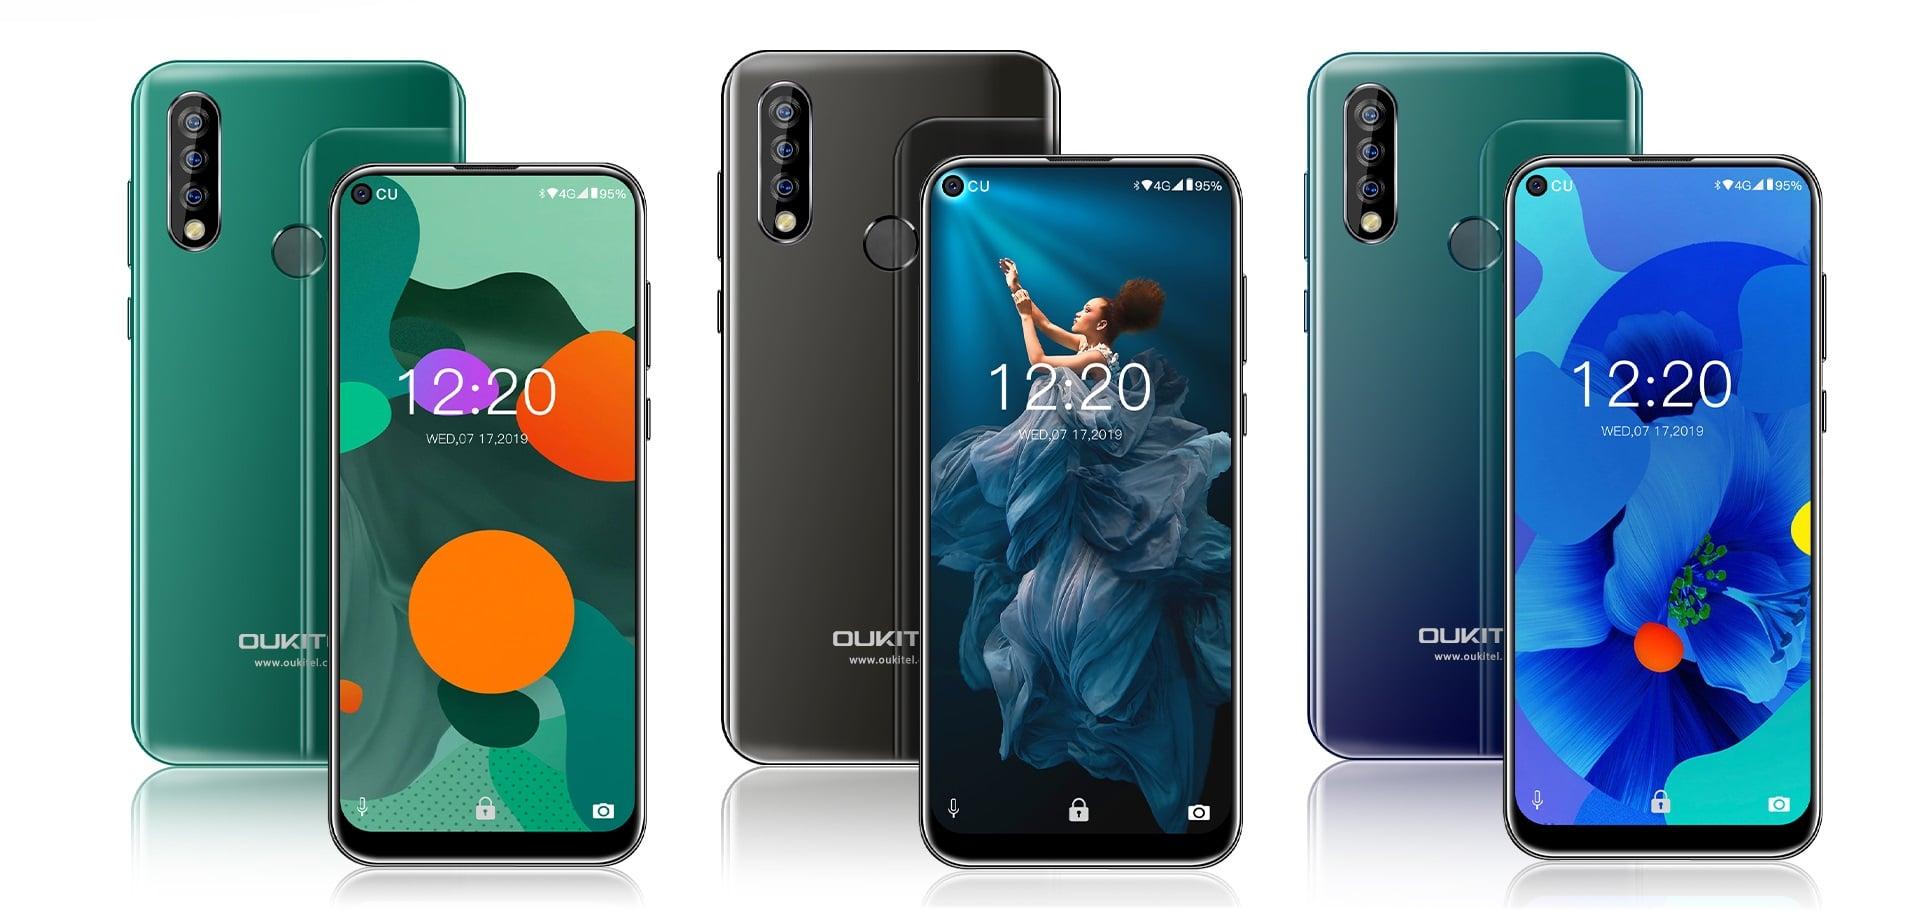 smartfon Oukitel C17 Pro